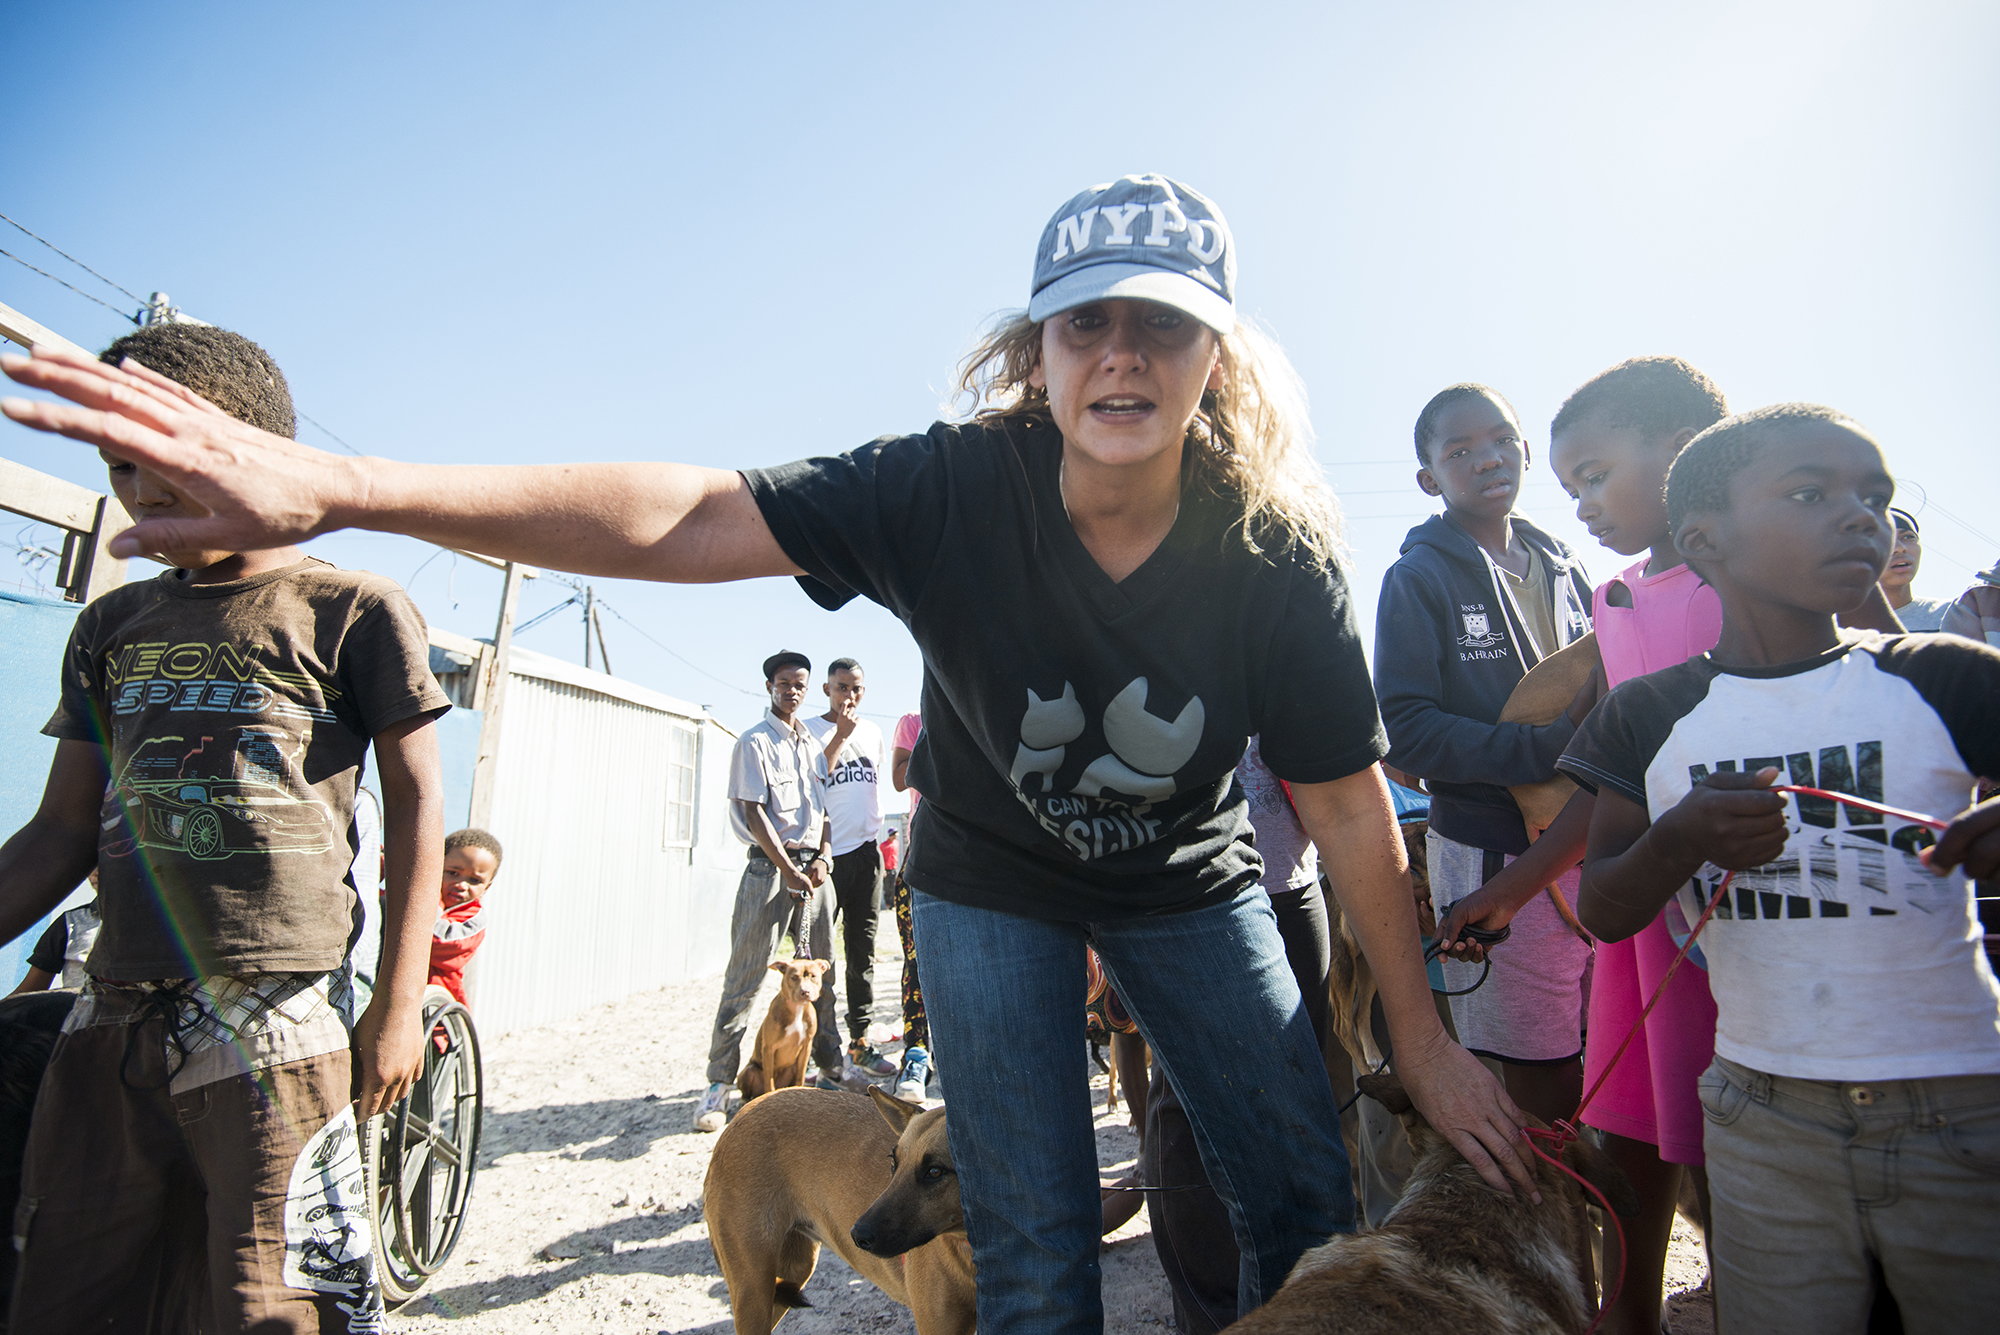 Rosie, at Blikkiesdorpe - Cape Town/South Africa